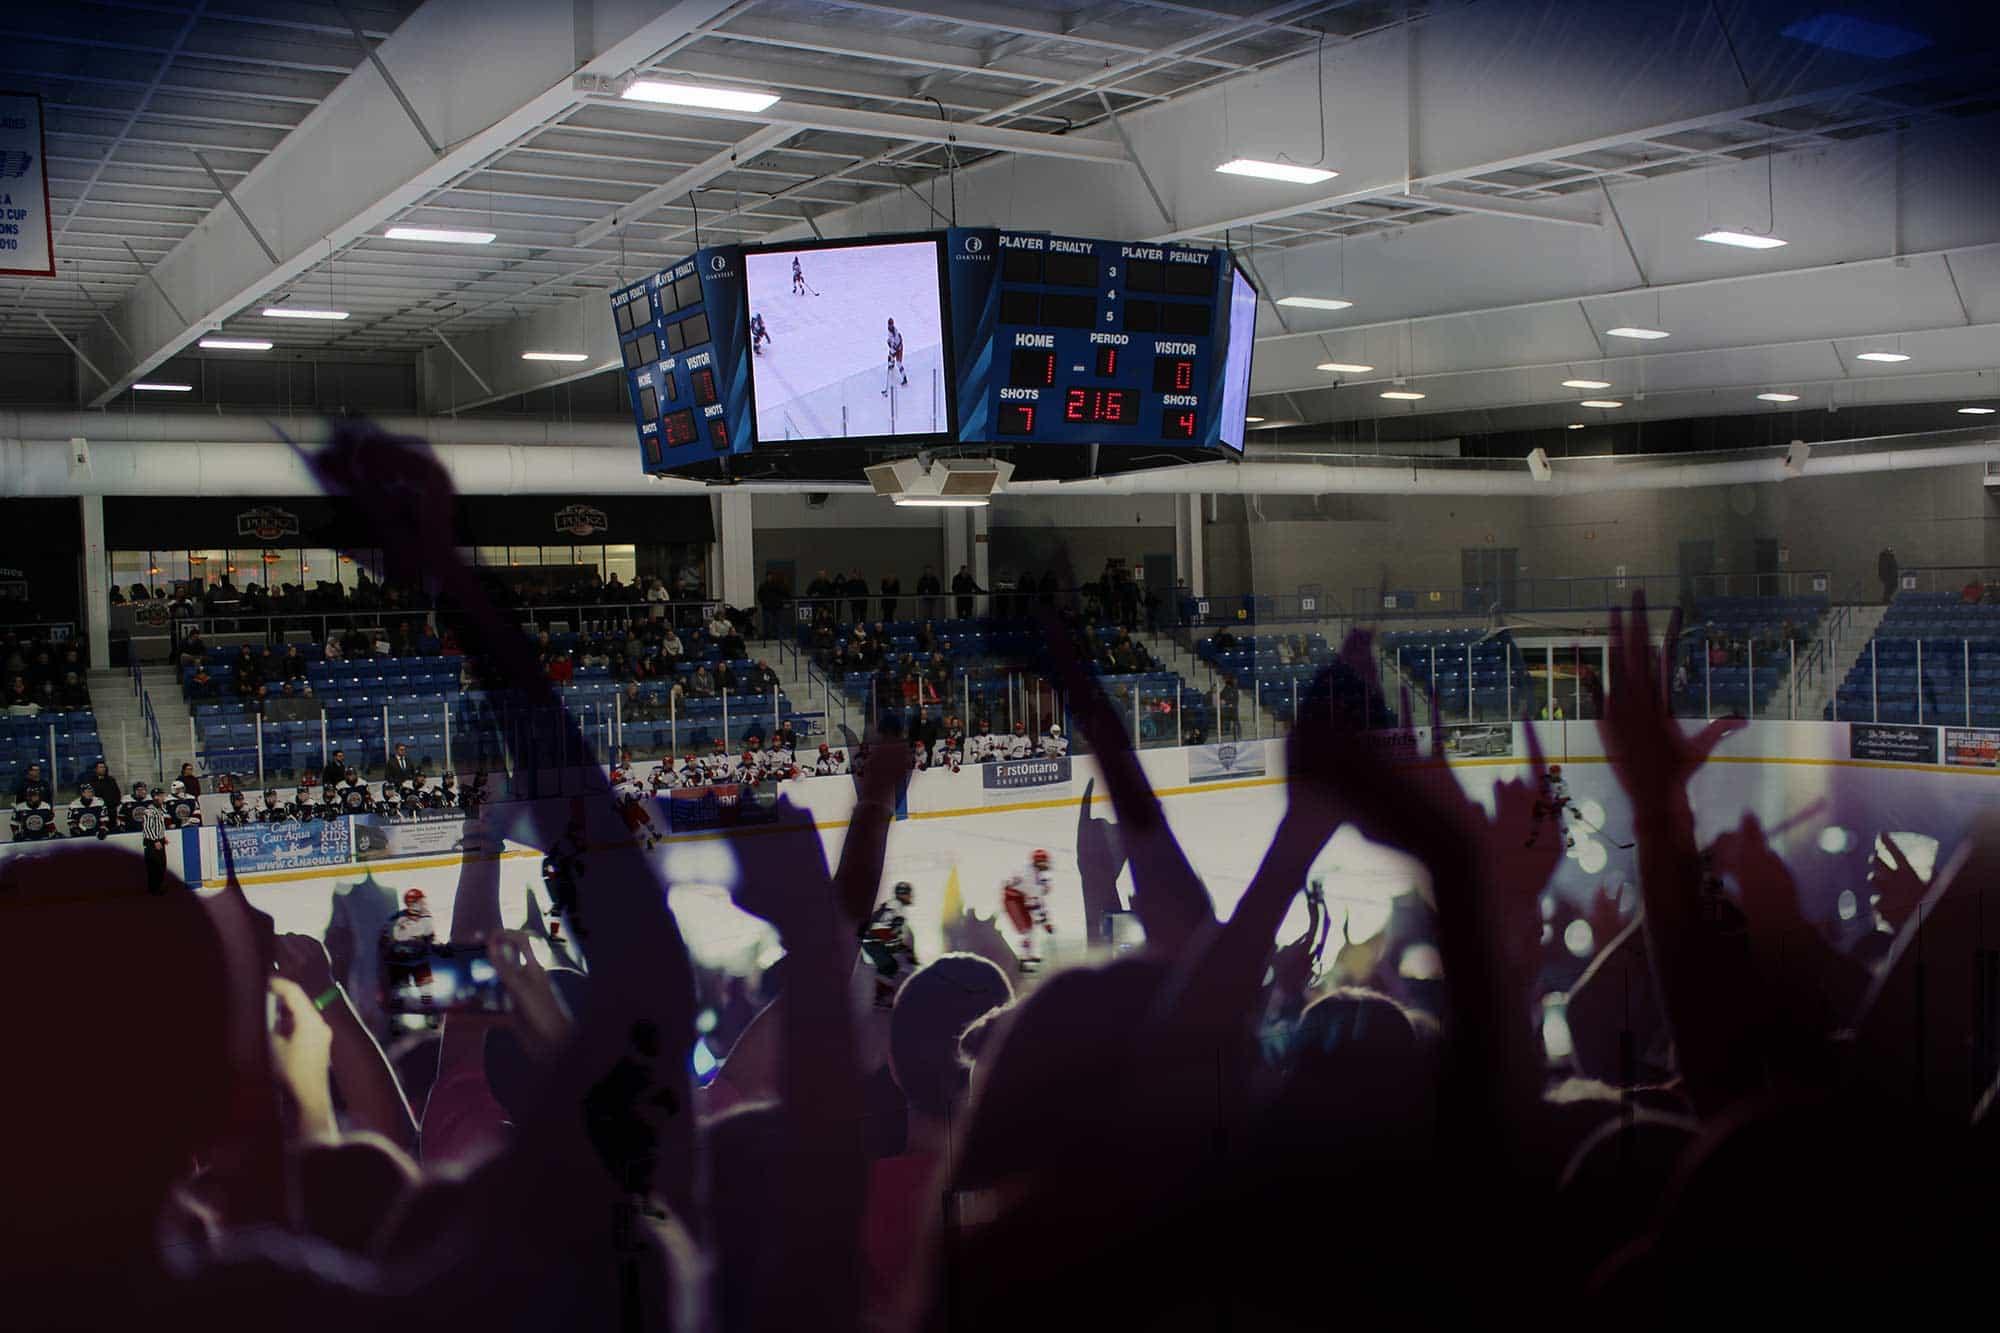 Scoreboard hockey game